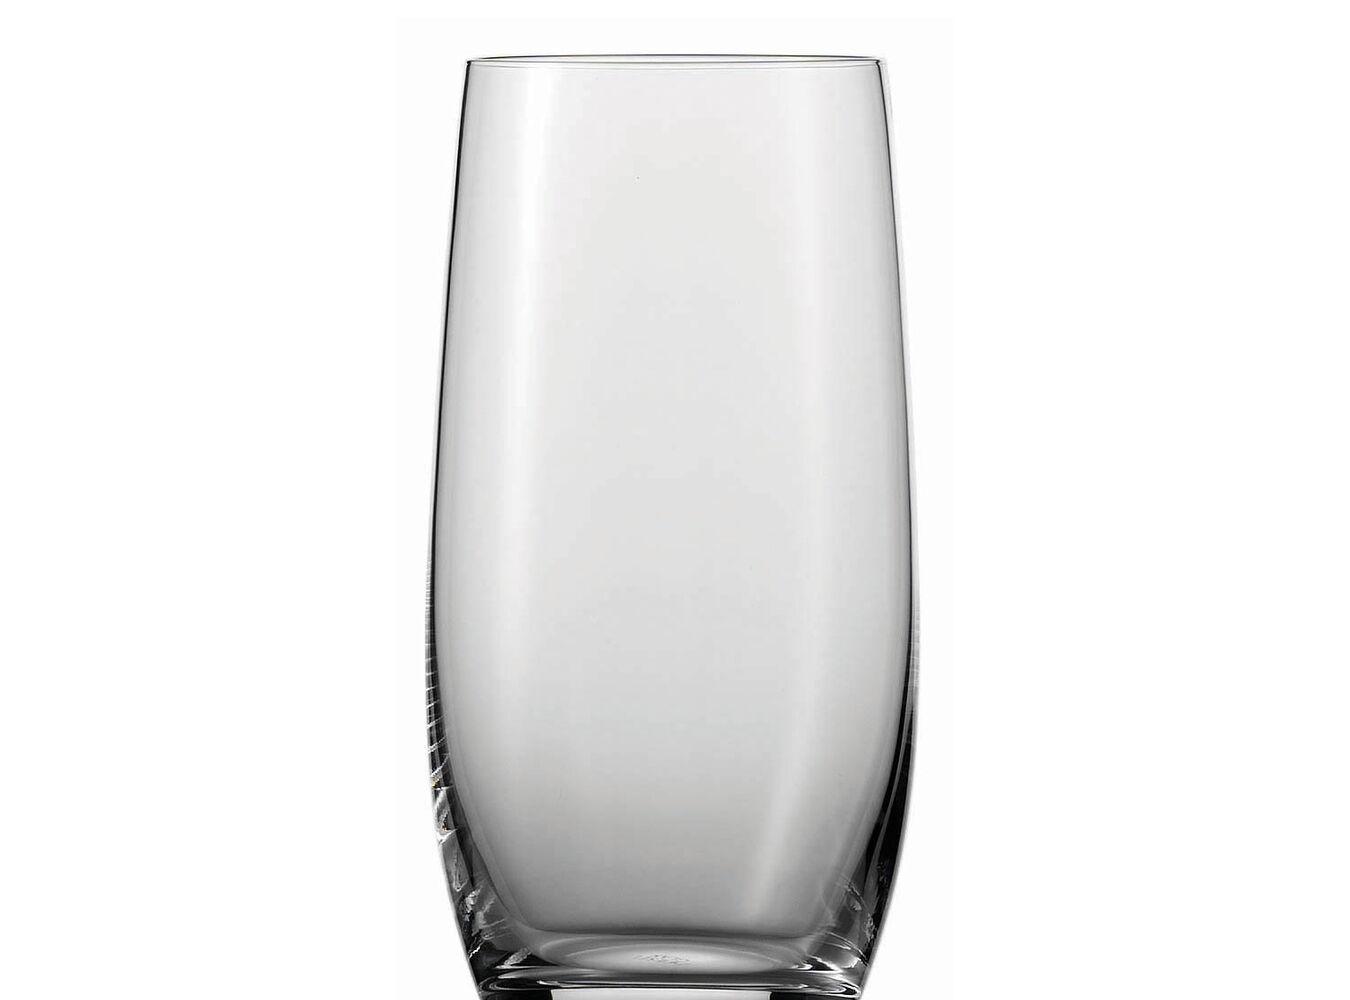 Schott Zwiesel Banquet Long Drink Glasses, Set of 6 | Sur La Table